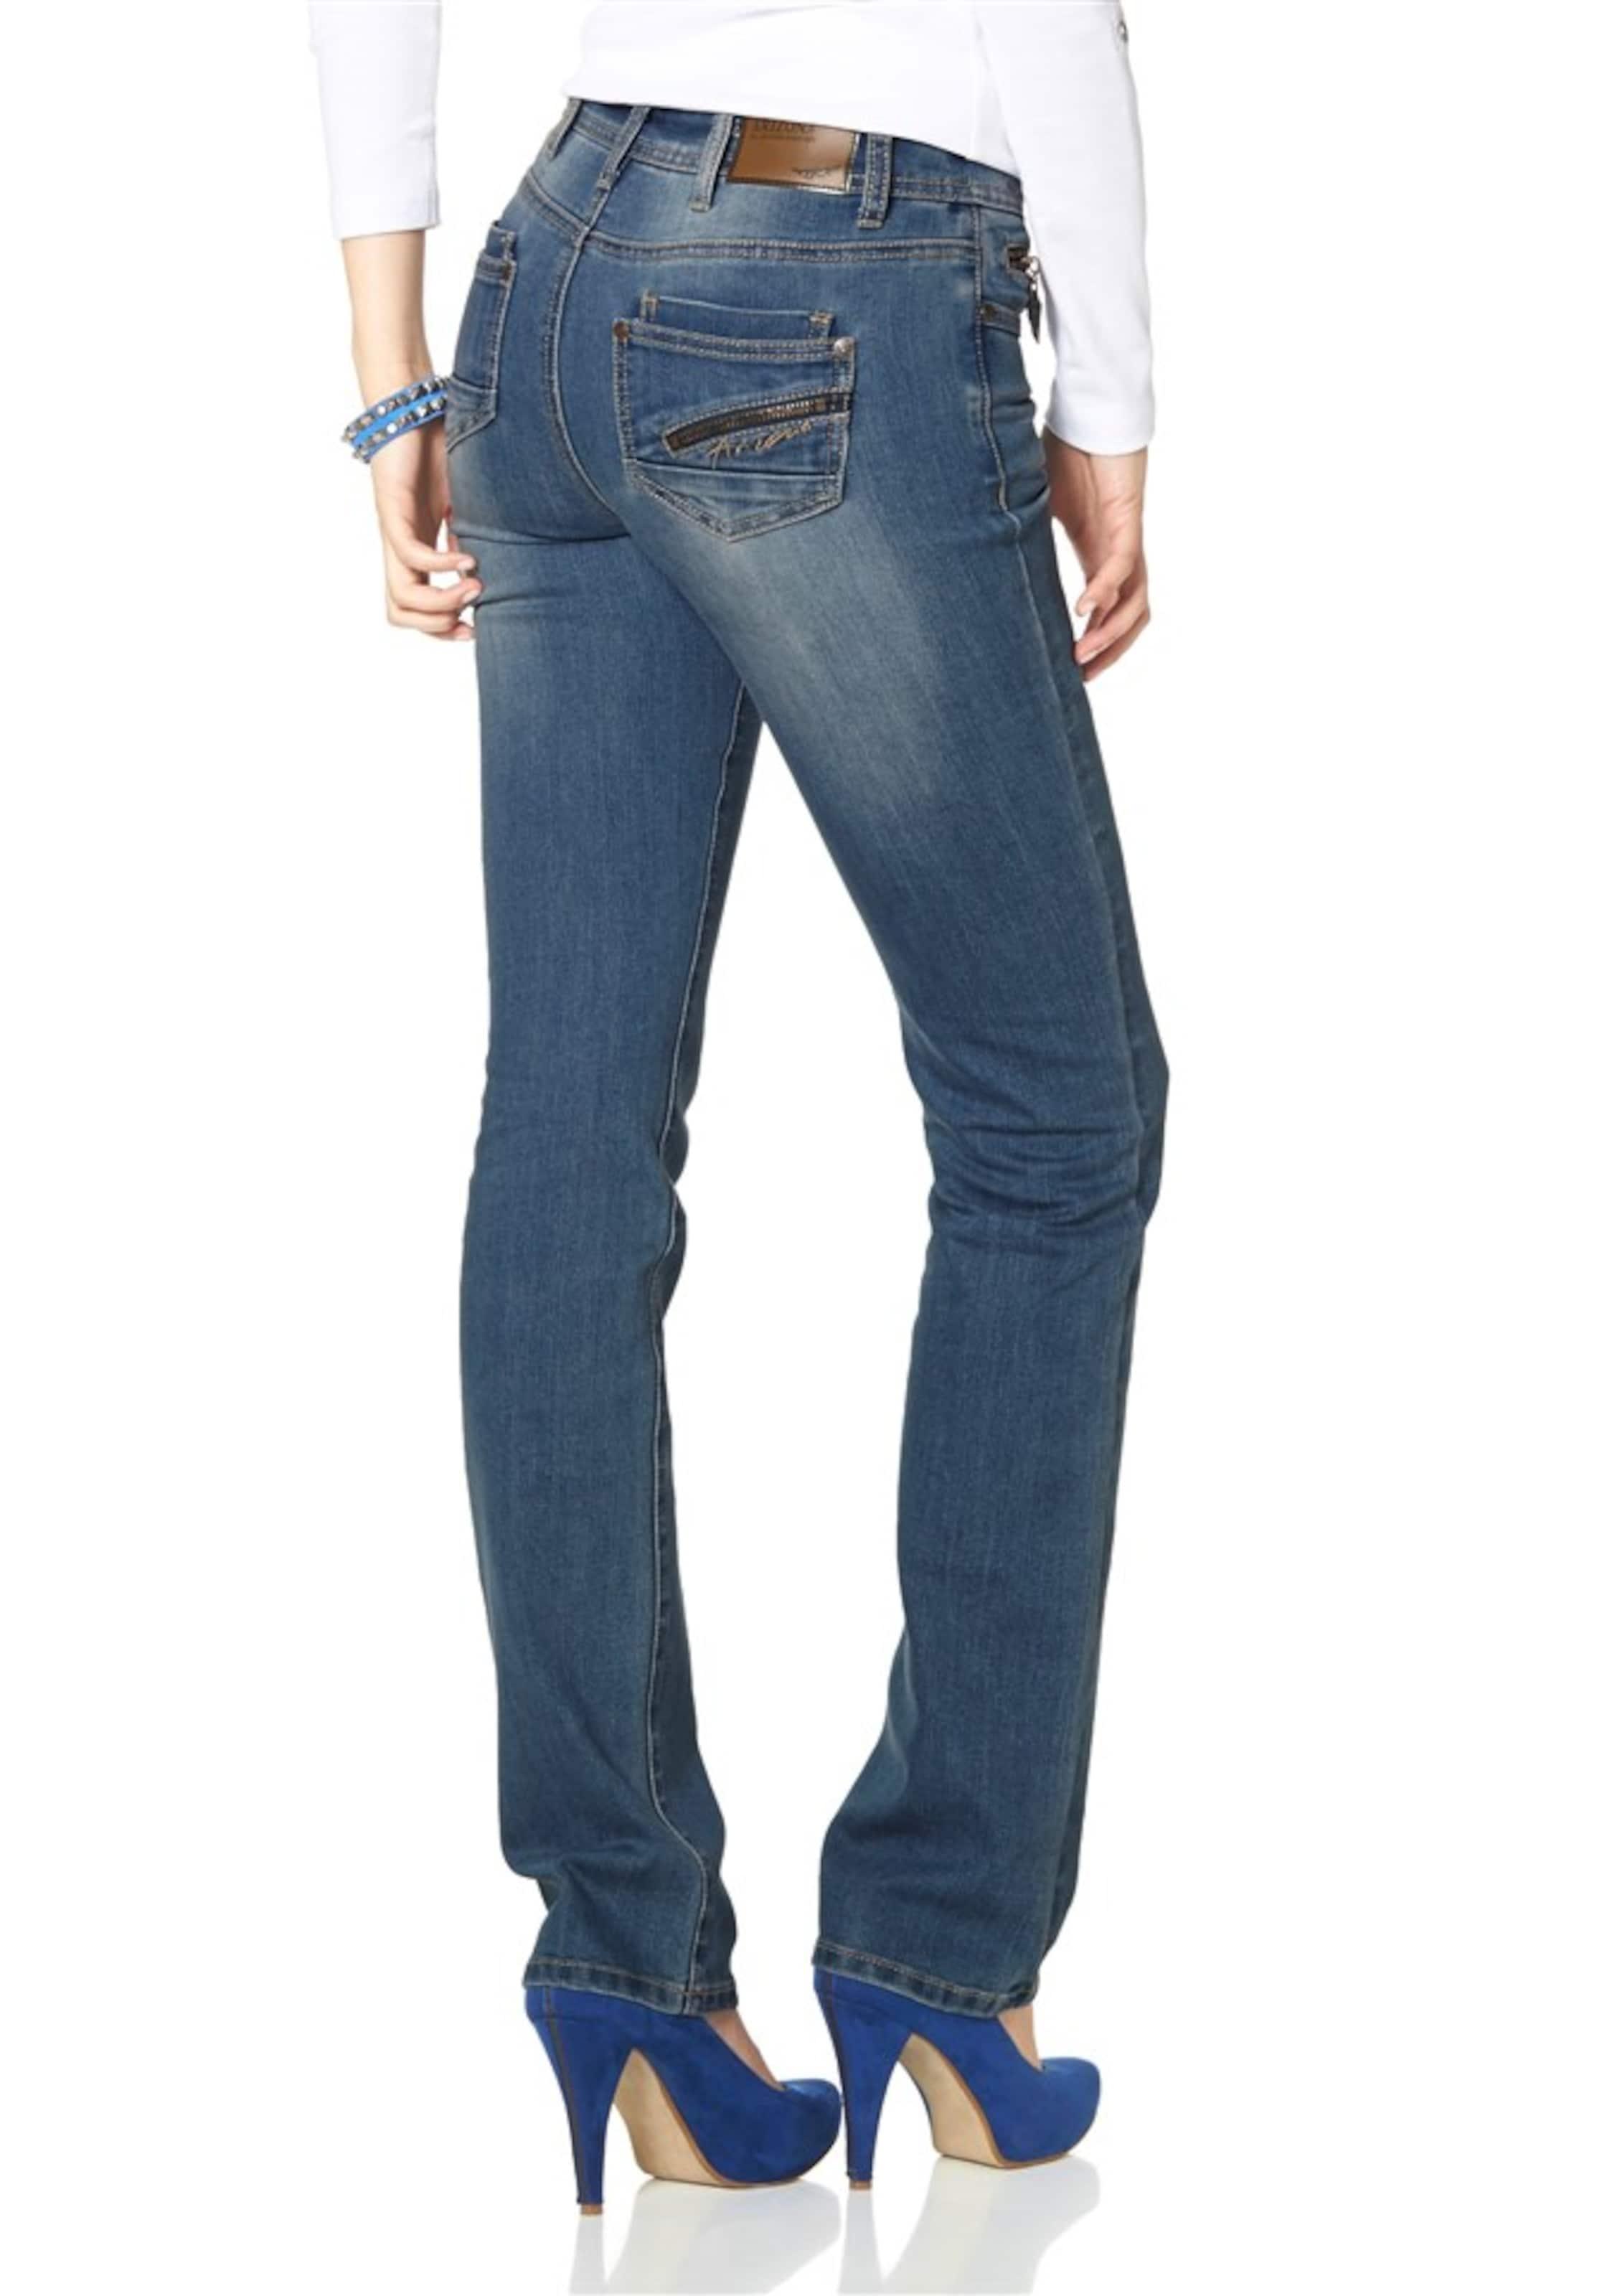 ARIZONA Gerade Jeans